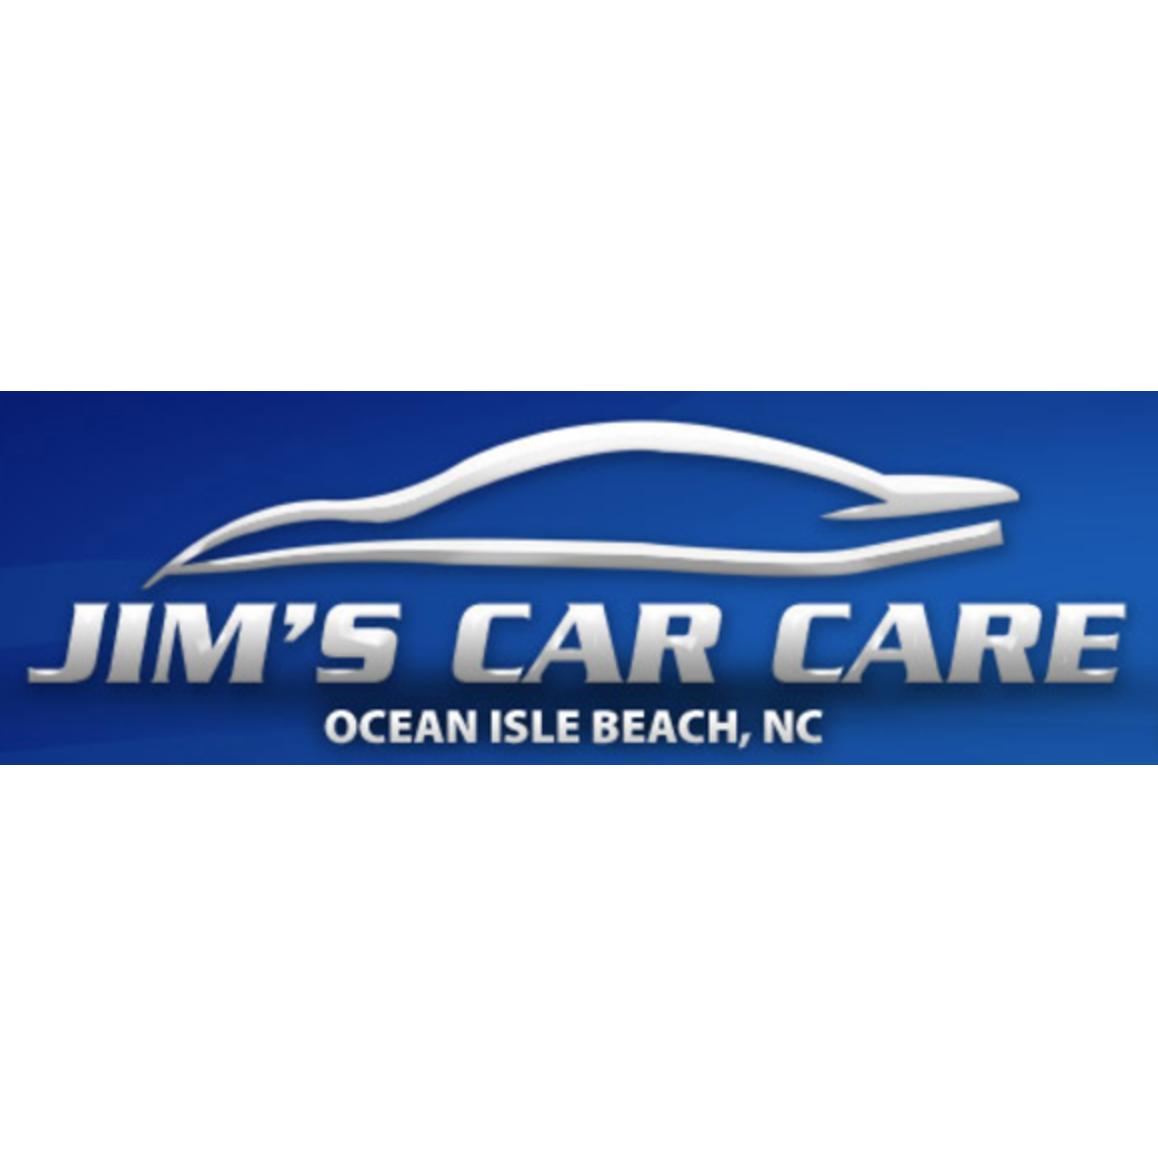 Jim's Car Care